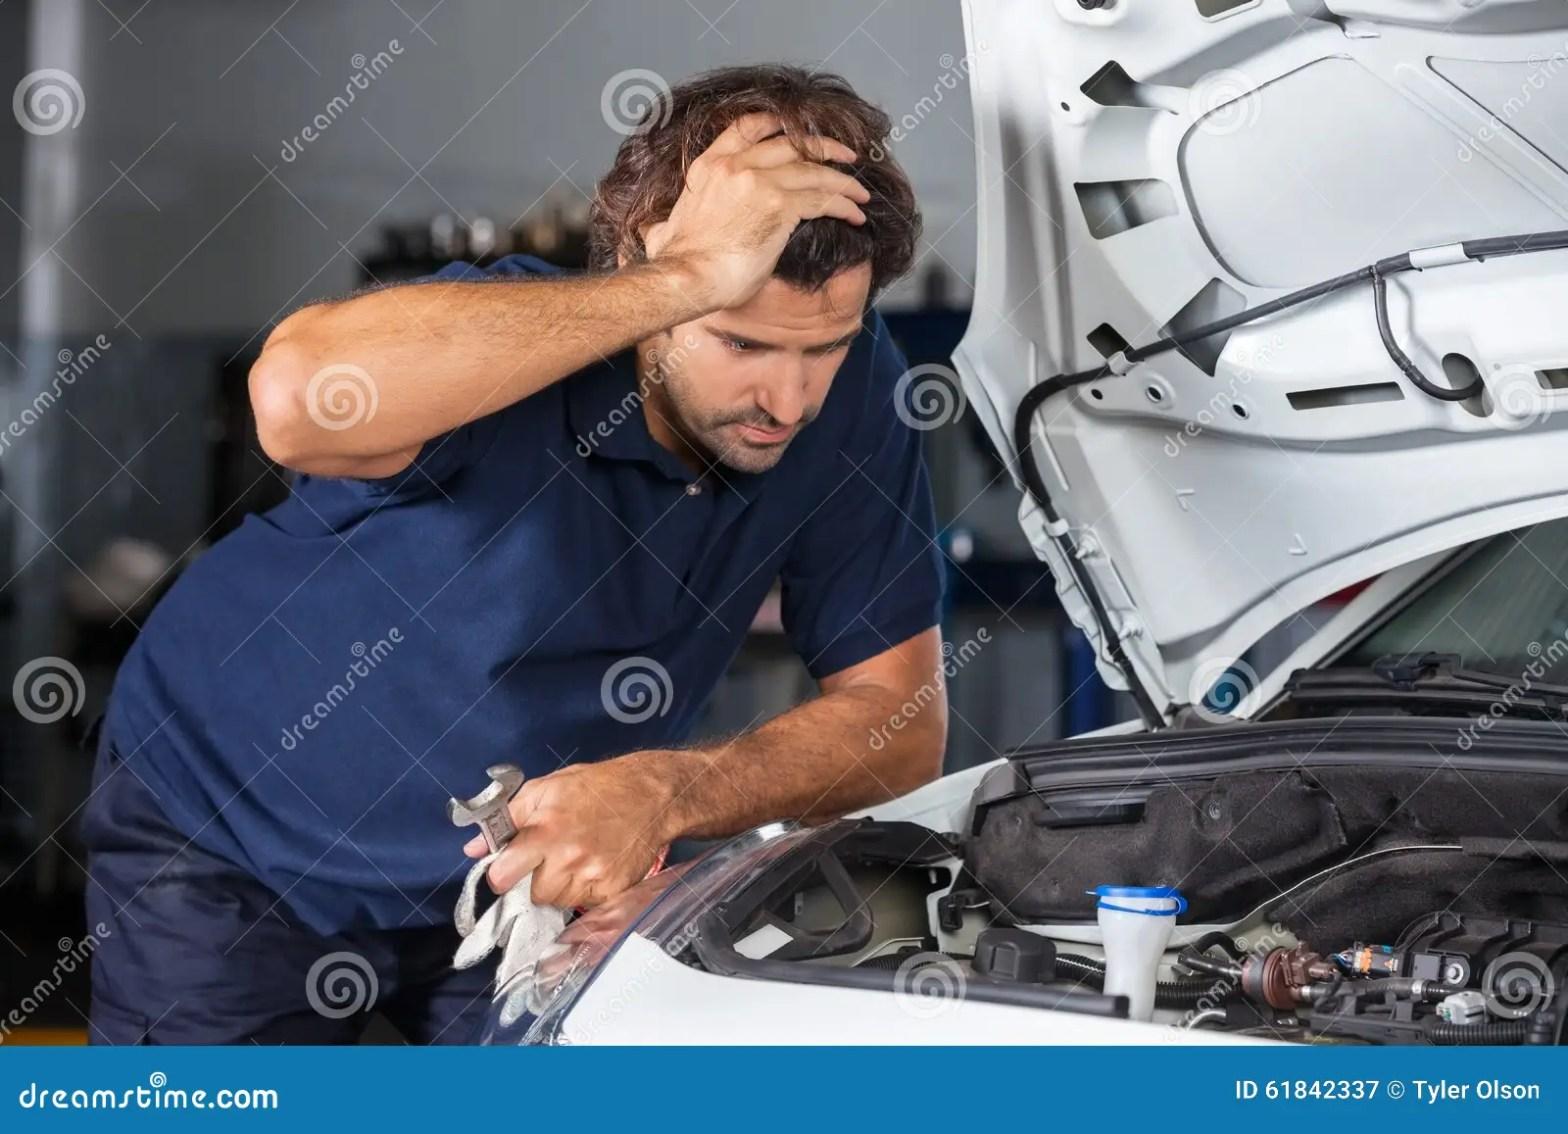 Mechanic Examining Car Engine At Repair Shop Stock Image